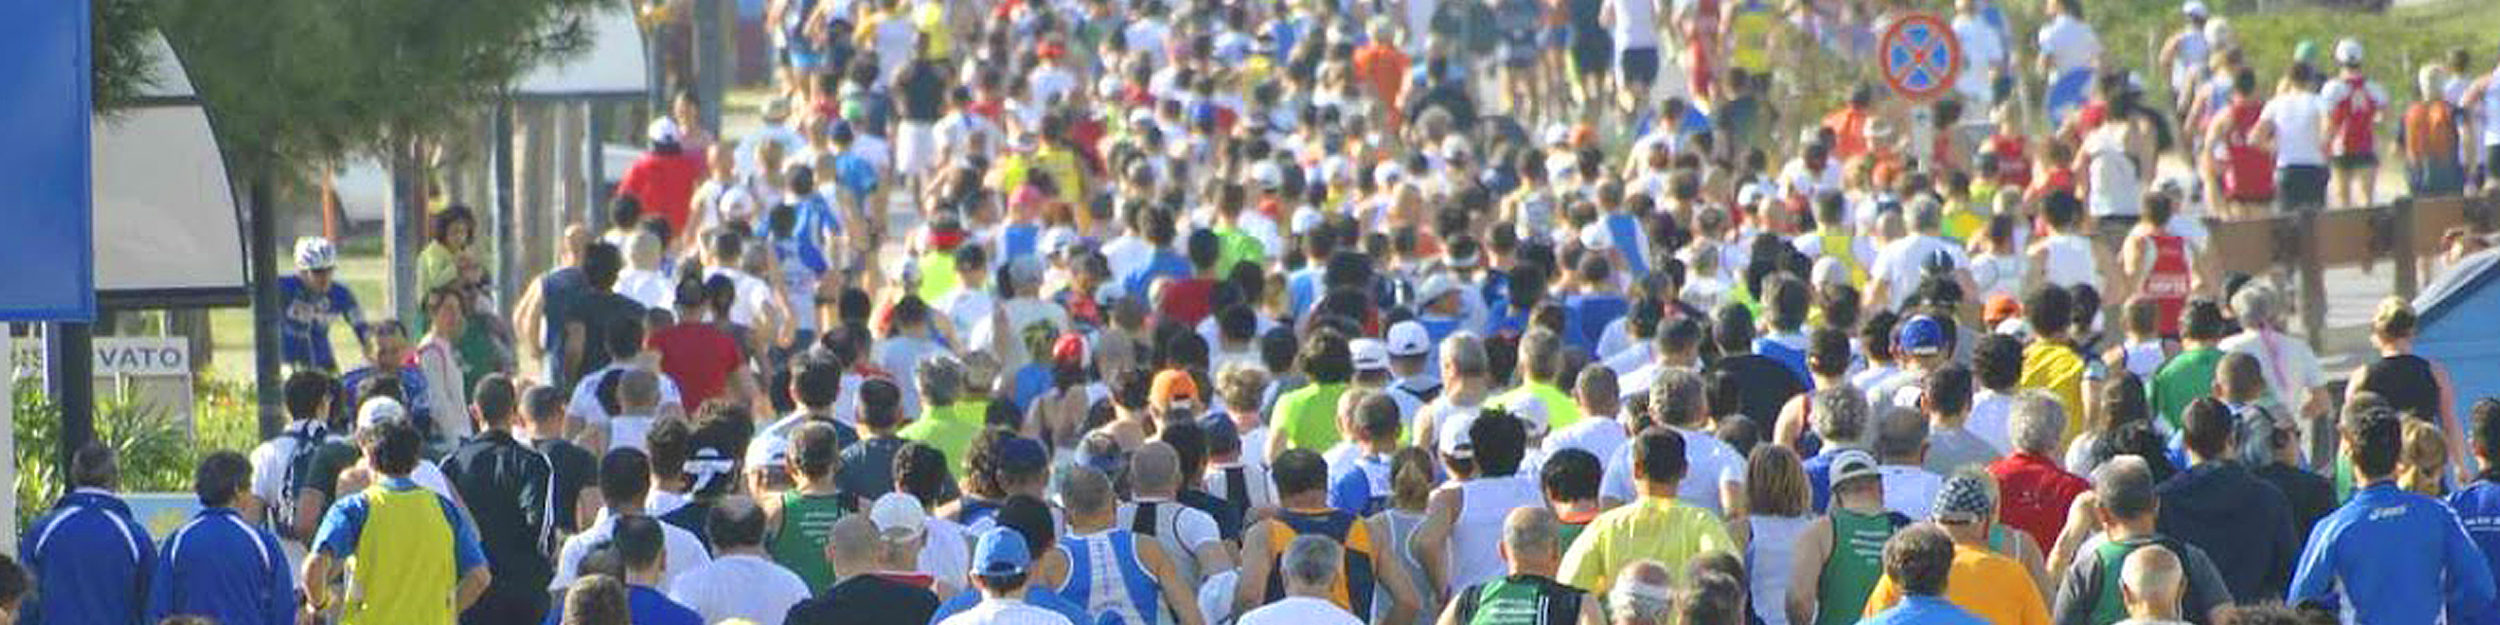 Conero Running ™ | Mezza Maratona